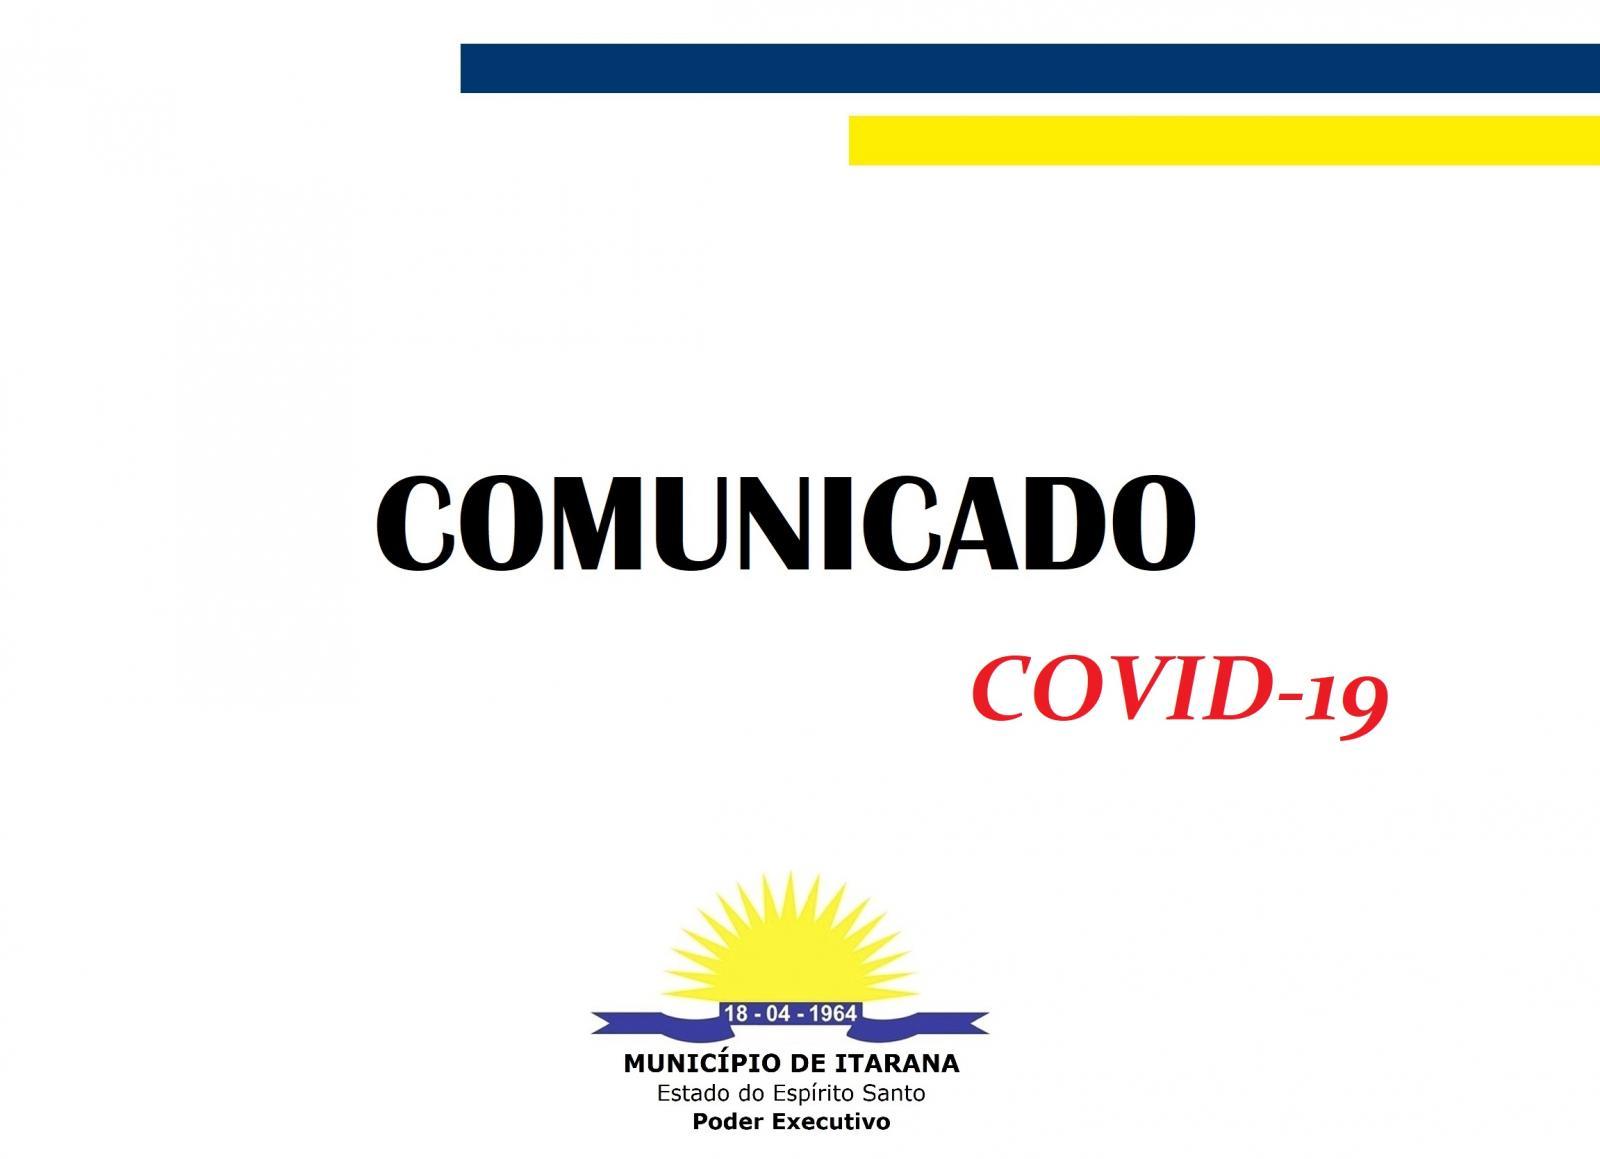 Coronavírus (COVID-19): Novo comunicado